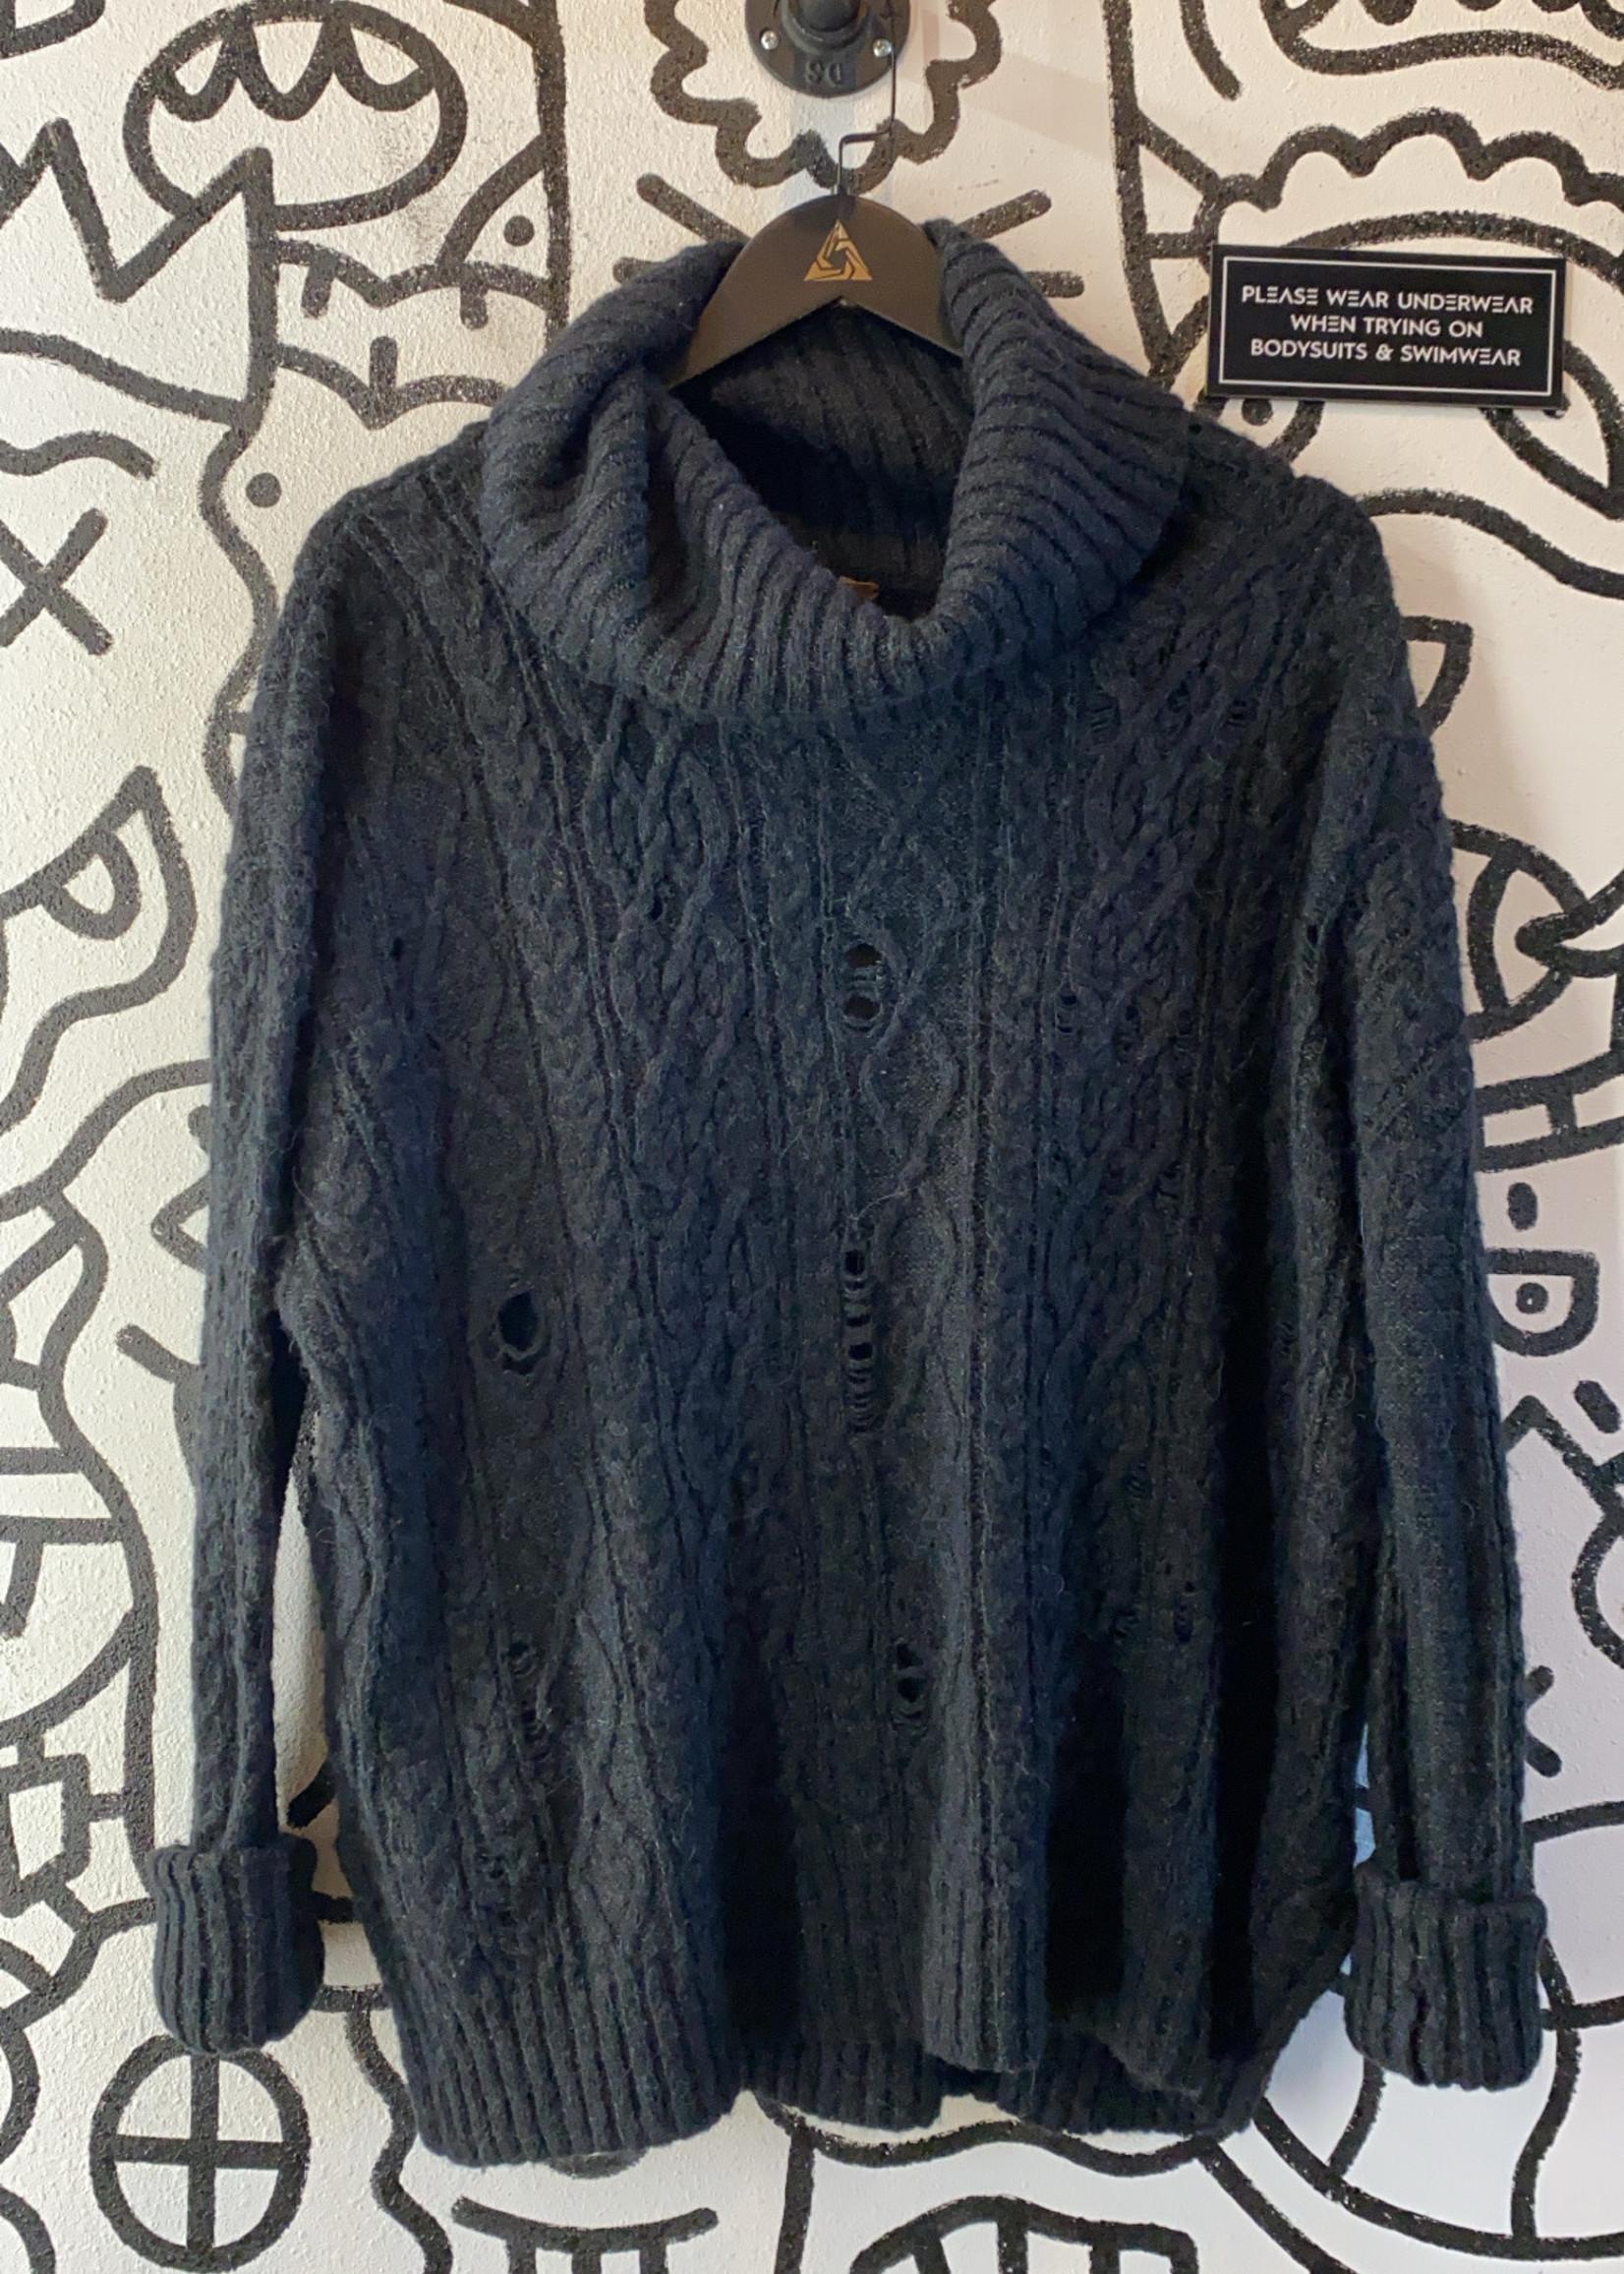 Free People Black/Grey Distressed Oversize Turtleneck Sweater M